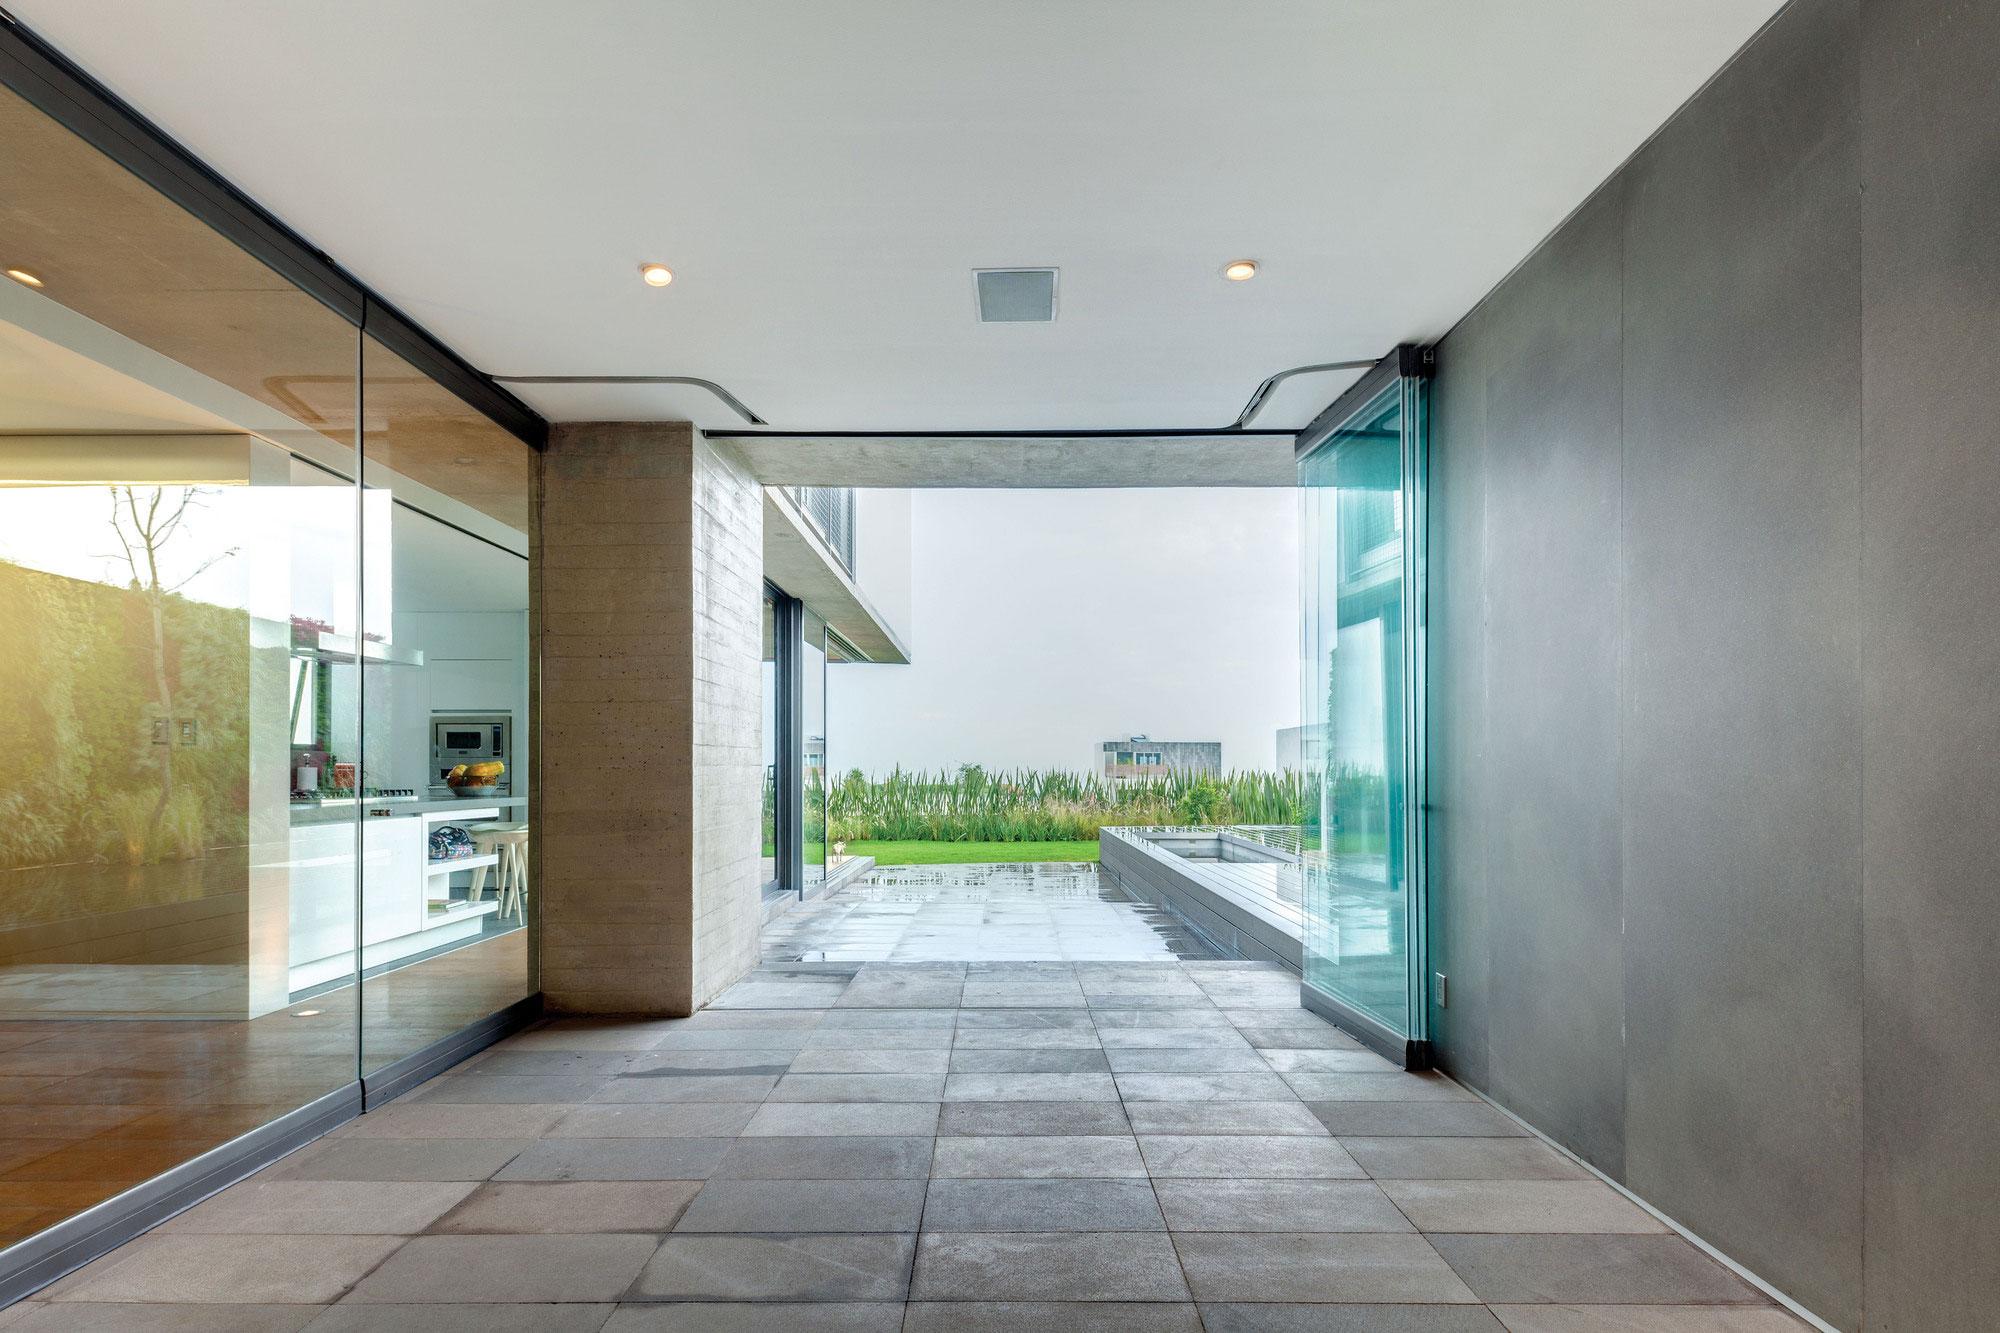 Natural Stone Floor. Image credit: Home Trend Design